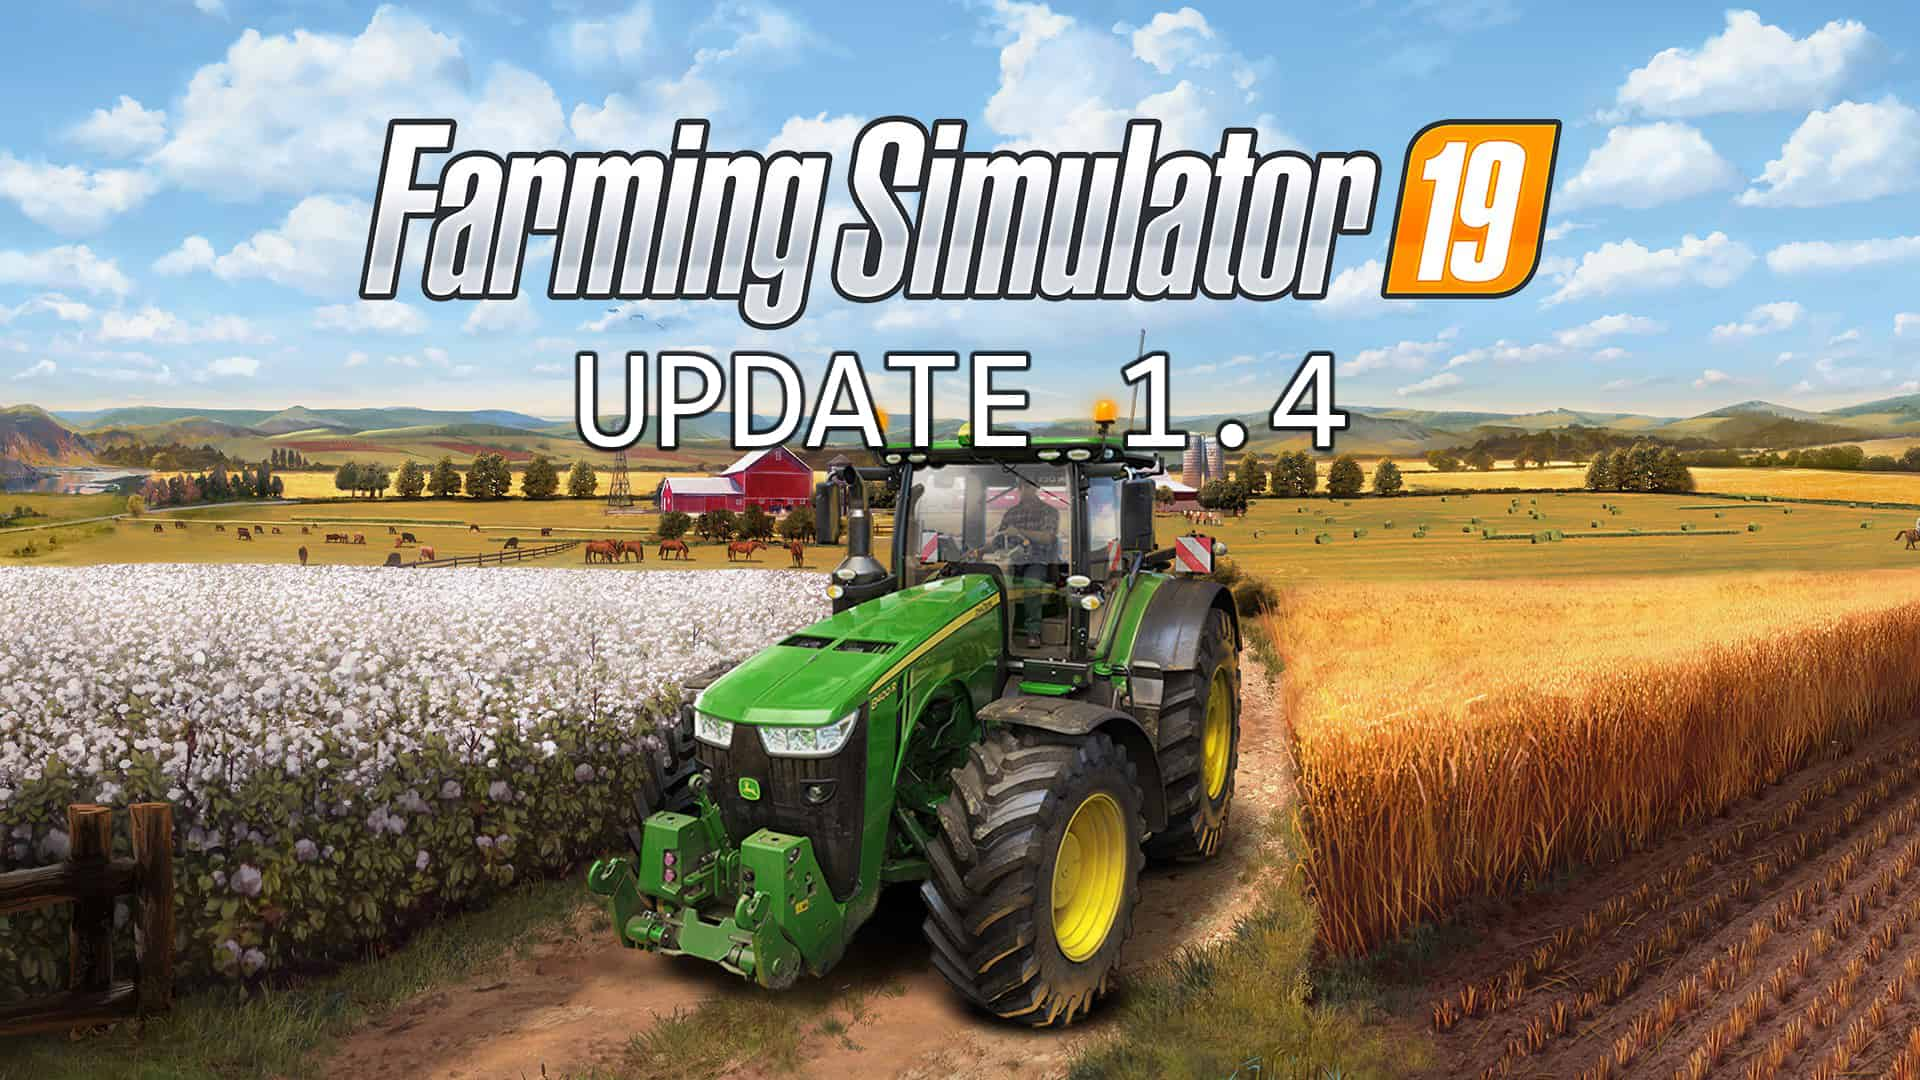 Farming Simulator 19 Update v1 4 FS19 - Farming Simulator 19